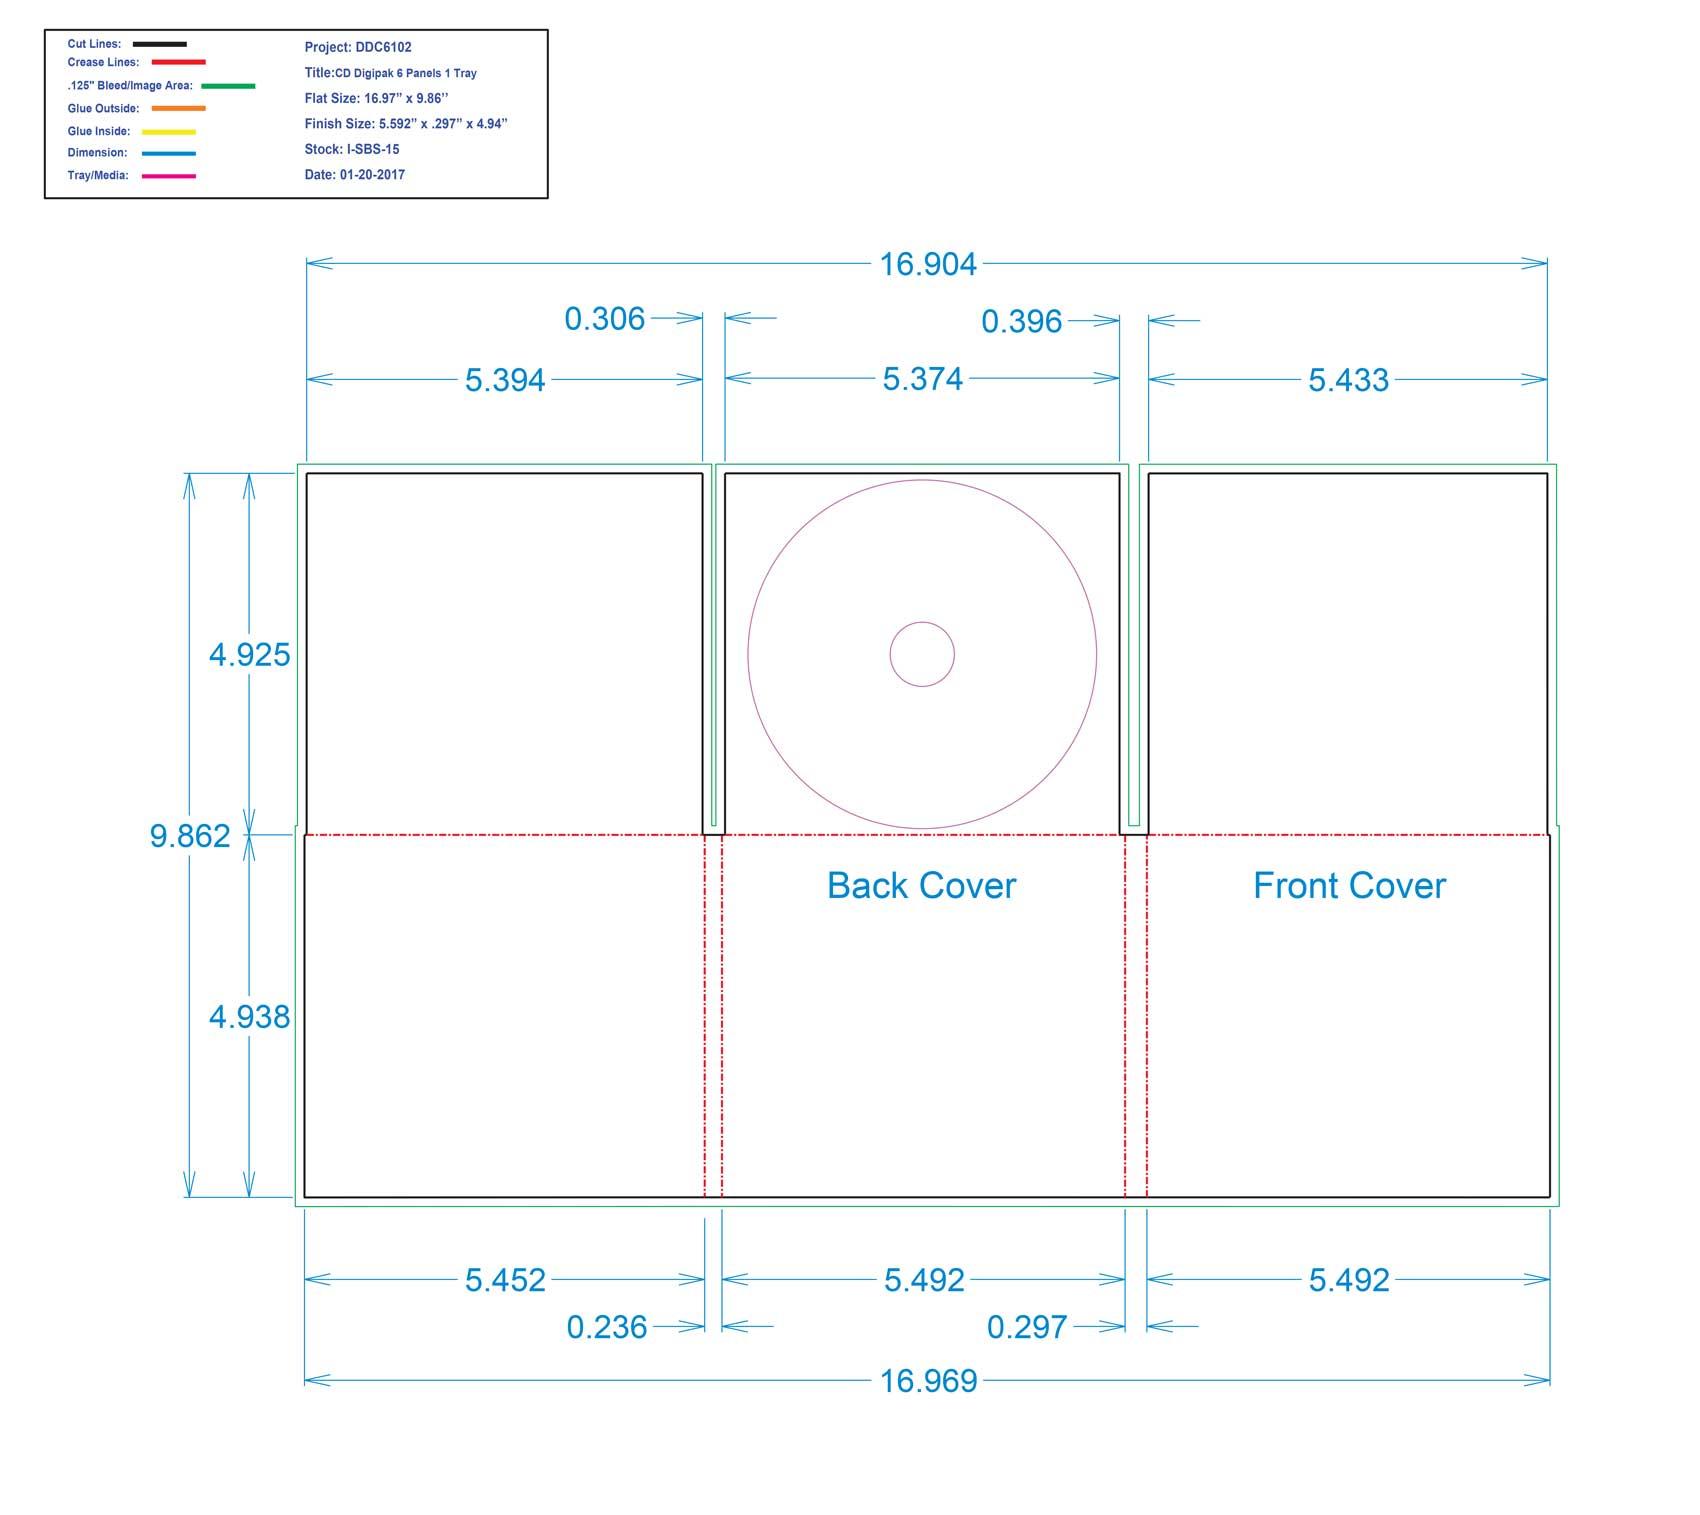 DDC6102 - 6 Panel One Tray No Pocket